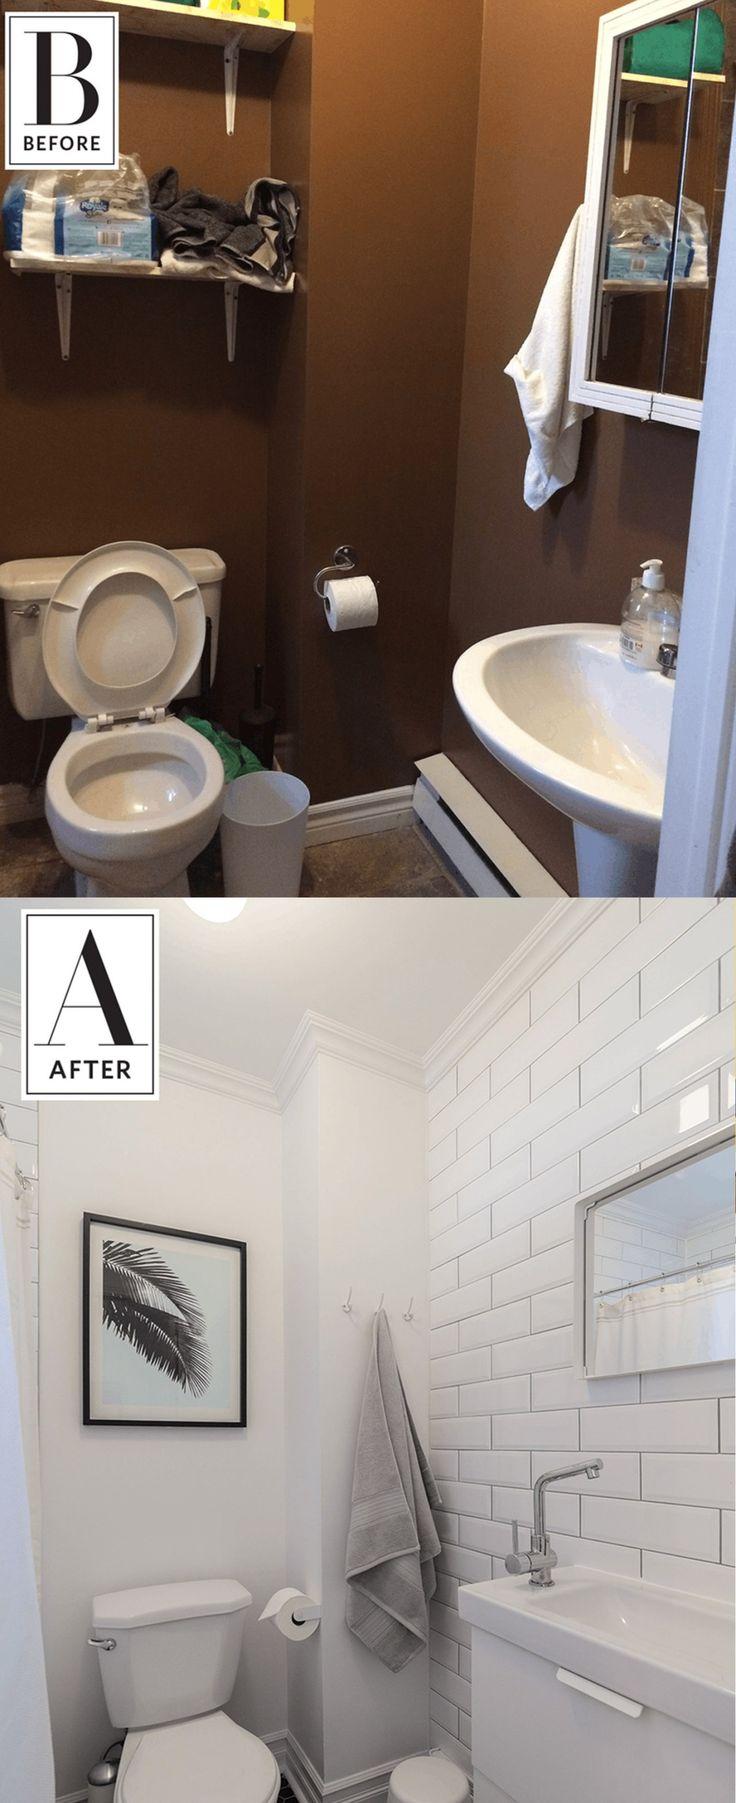 Manly Bathroom Lights: 25+ Best Ideas About Masculine Bathroom On Pinterest